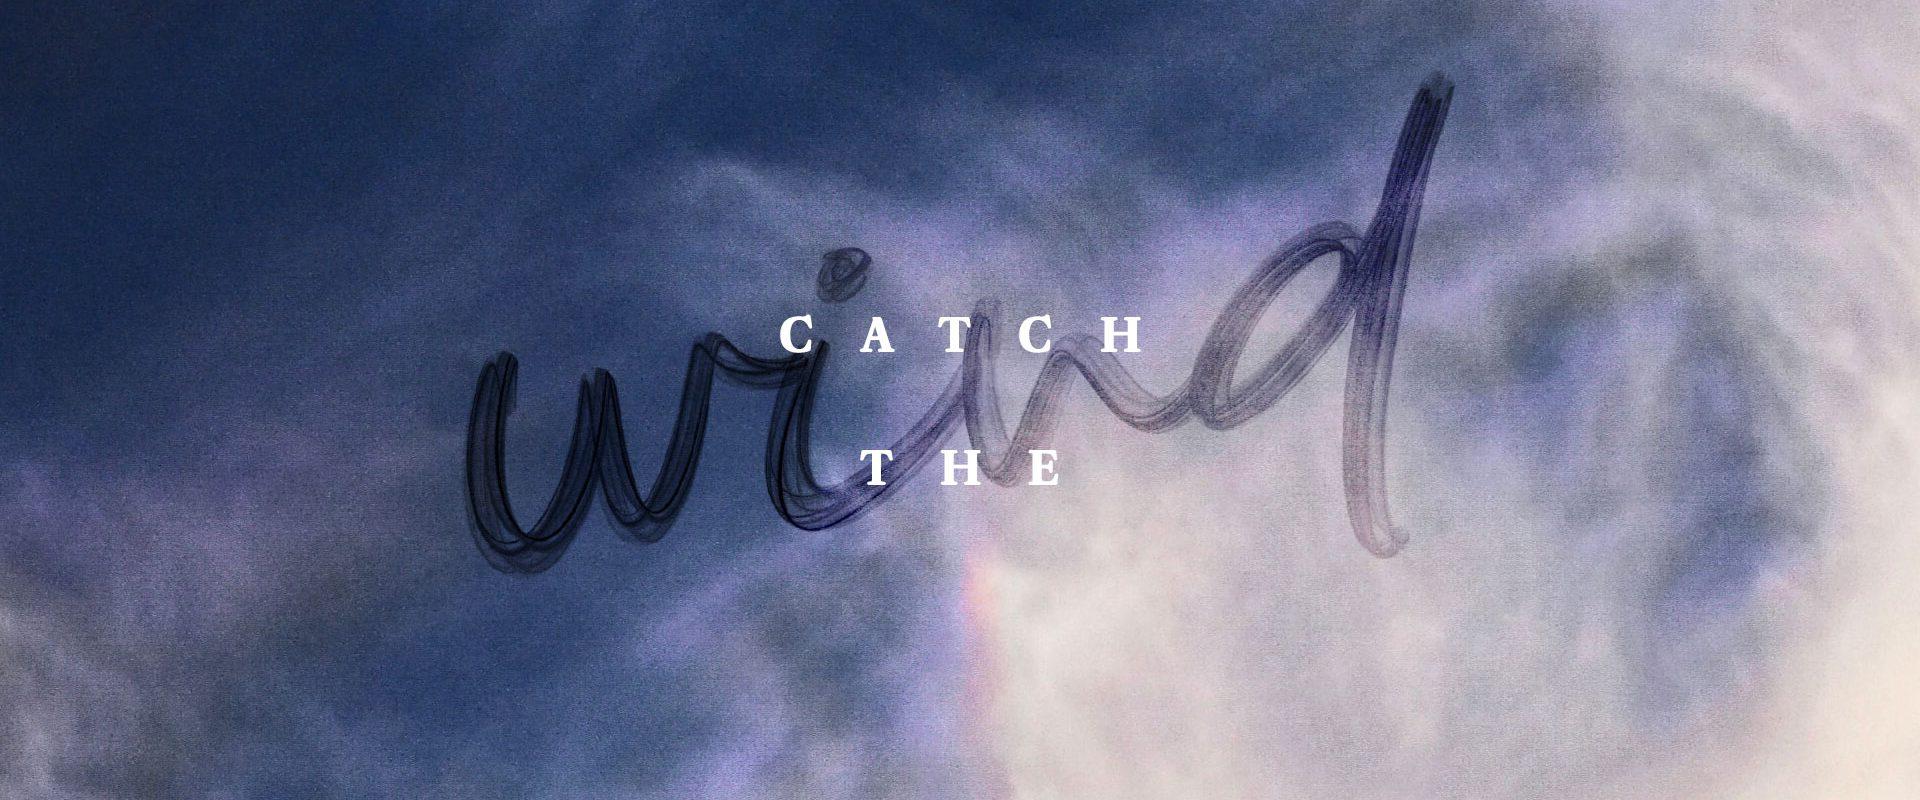 CatchTheWind_1920x1080